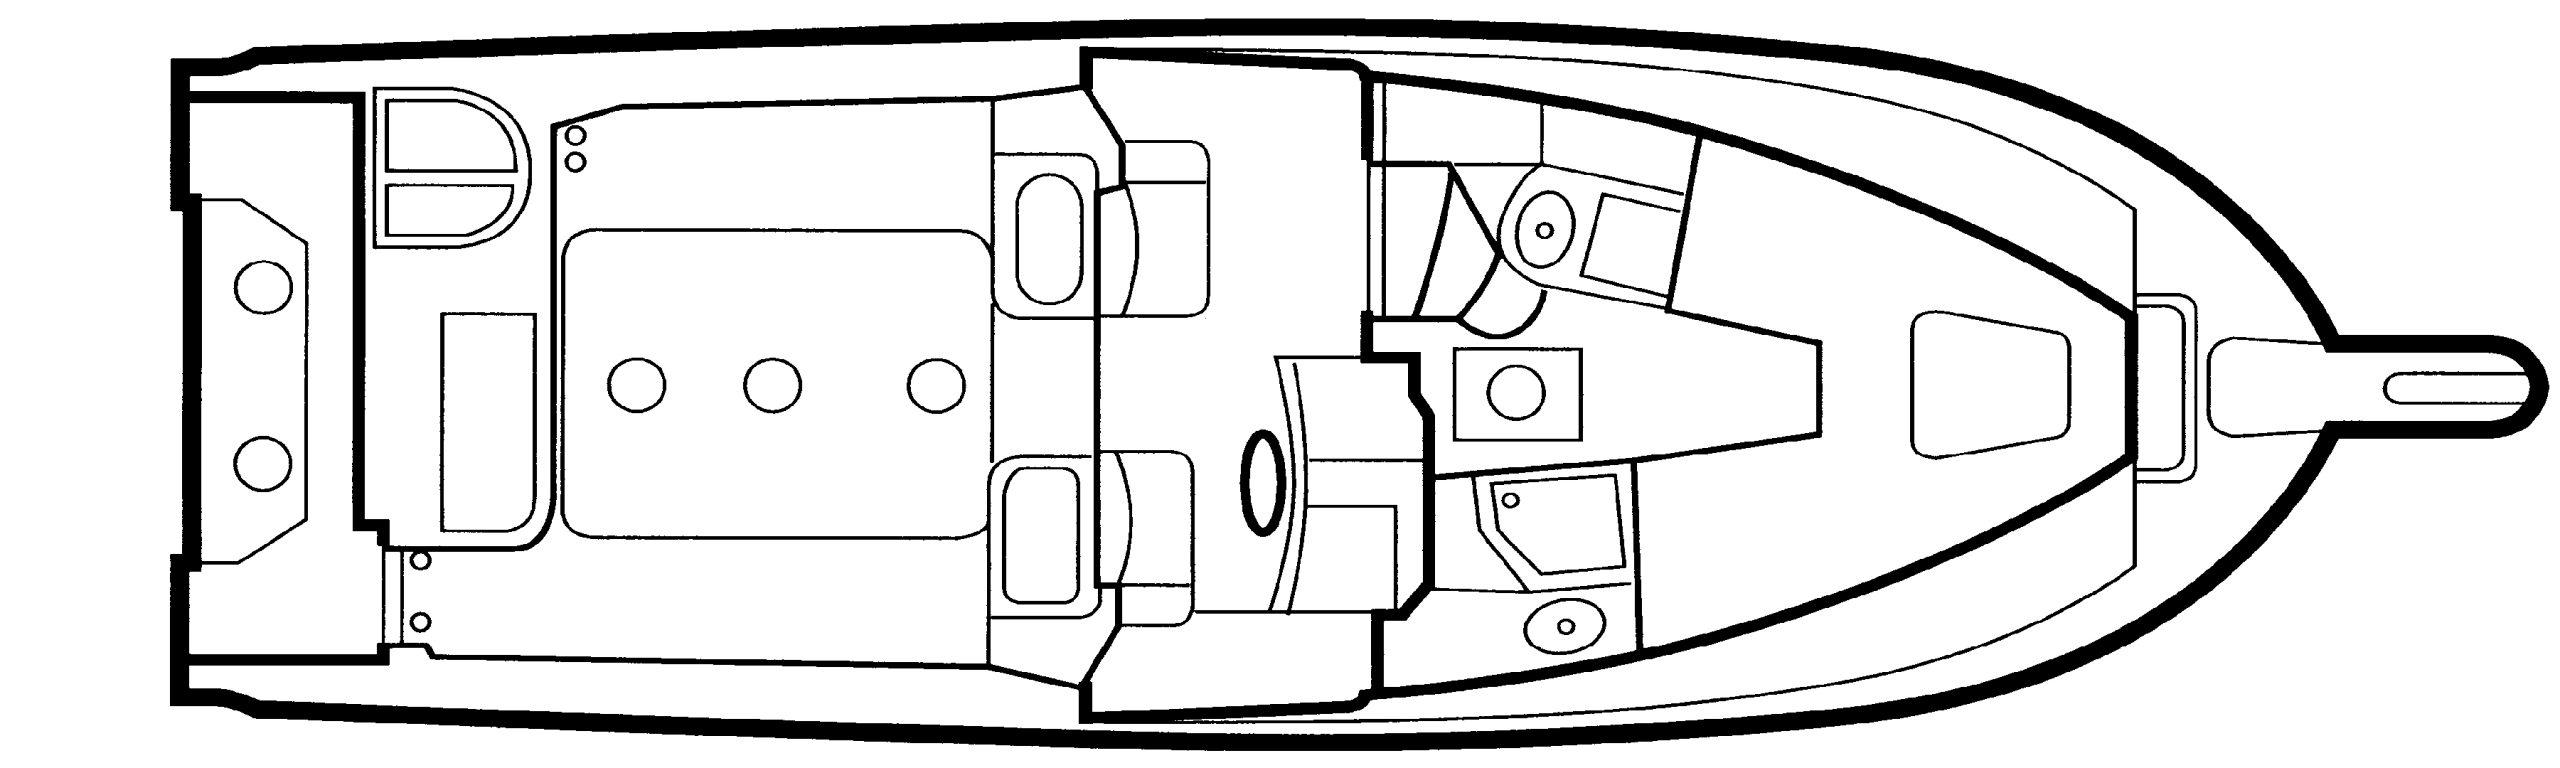 282 Sailfish Floor Plan 2